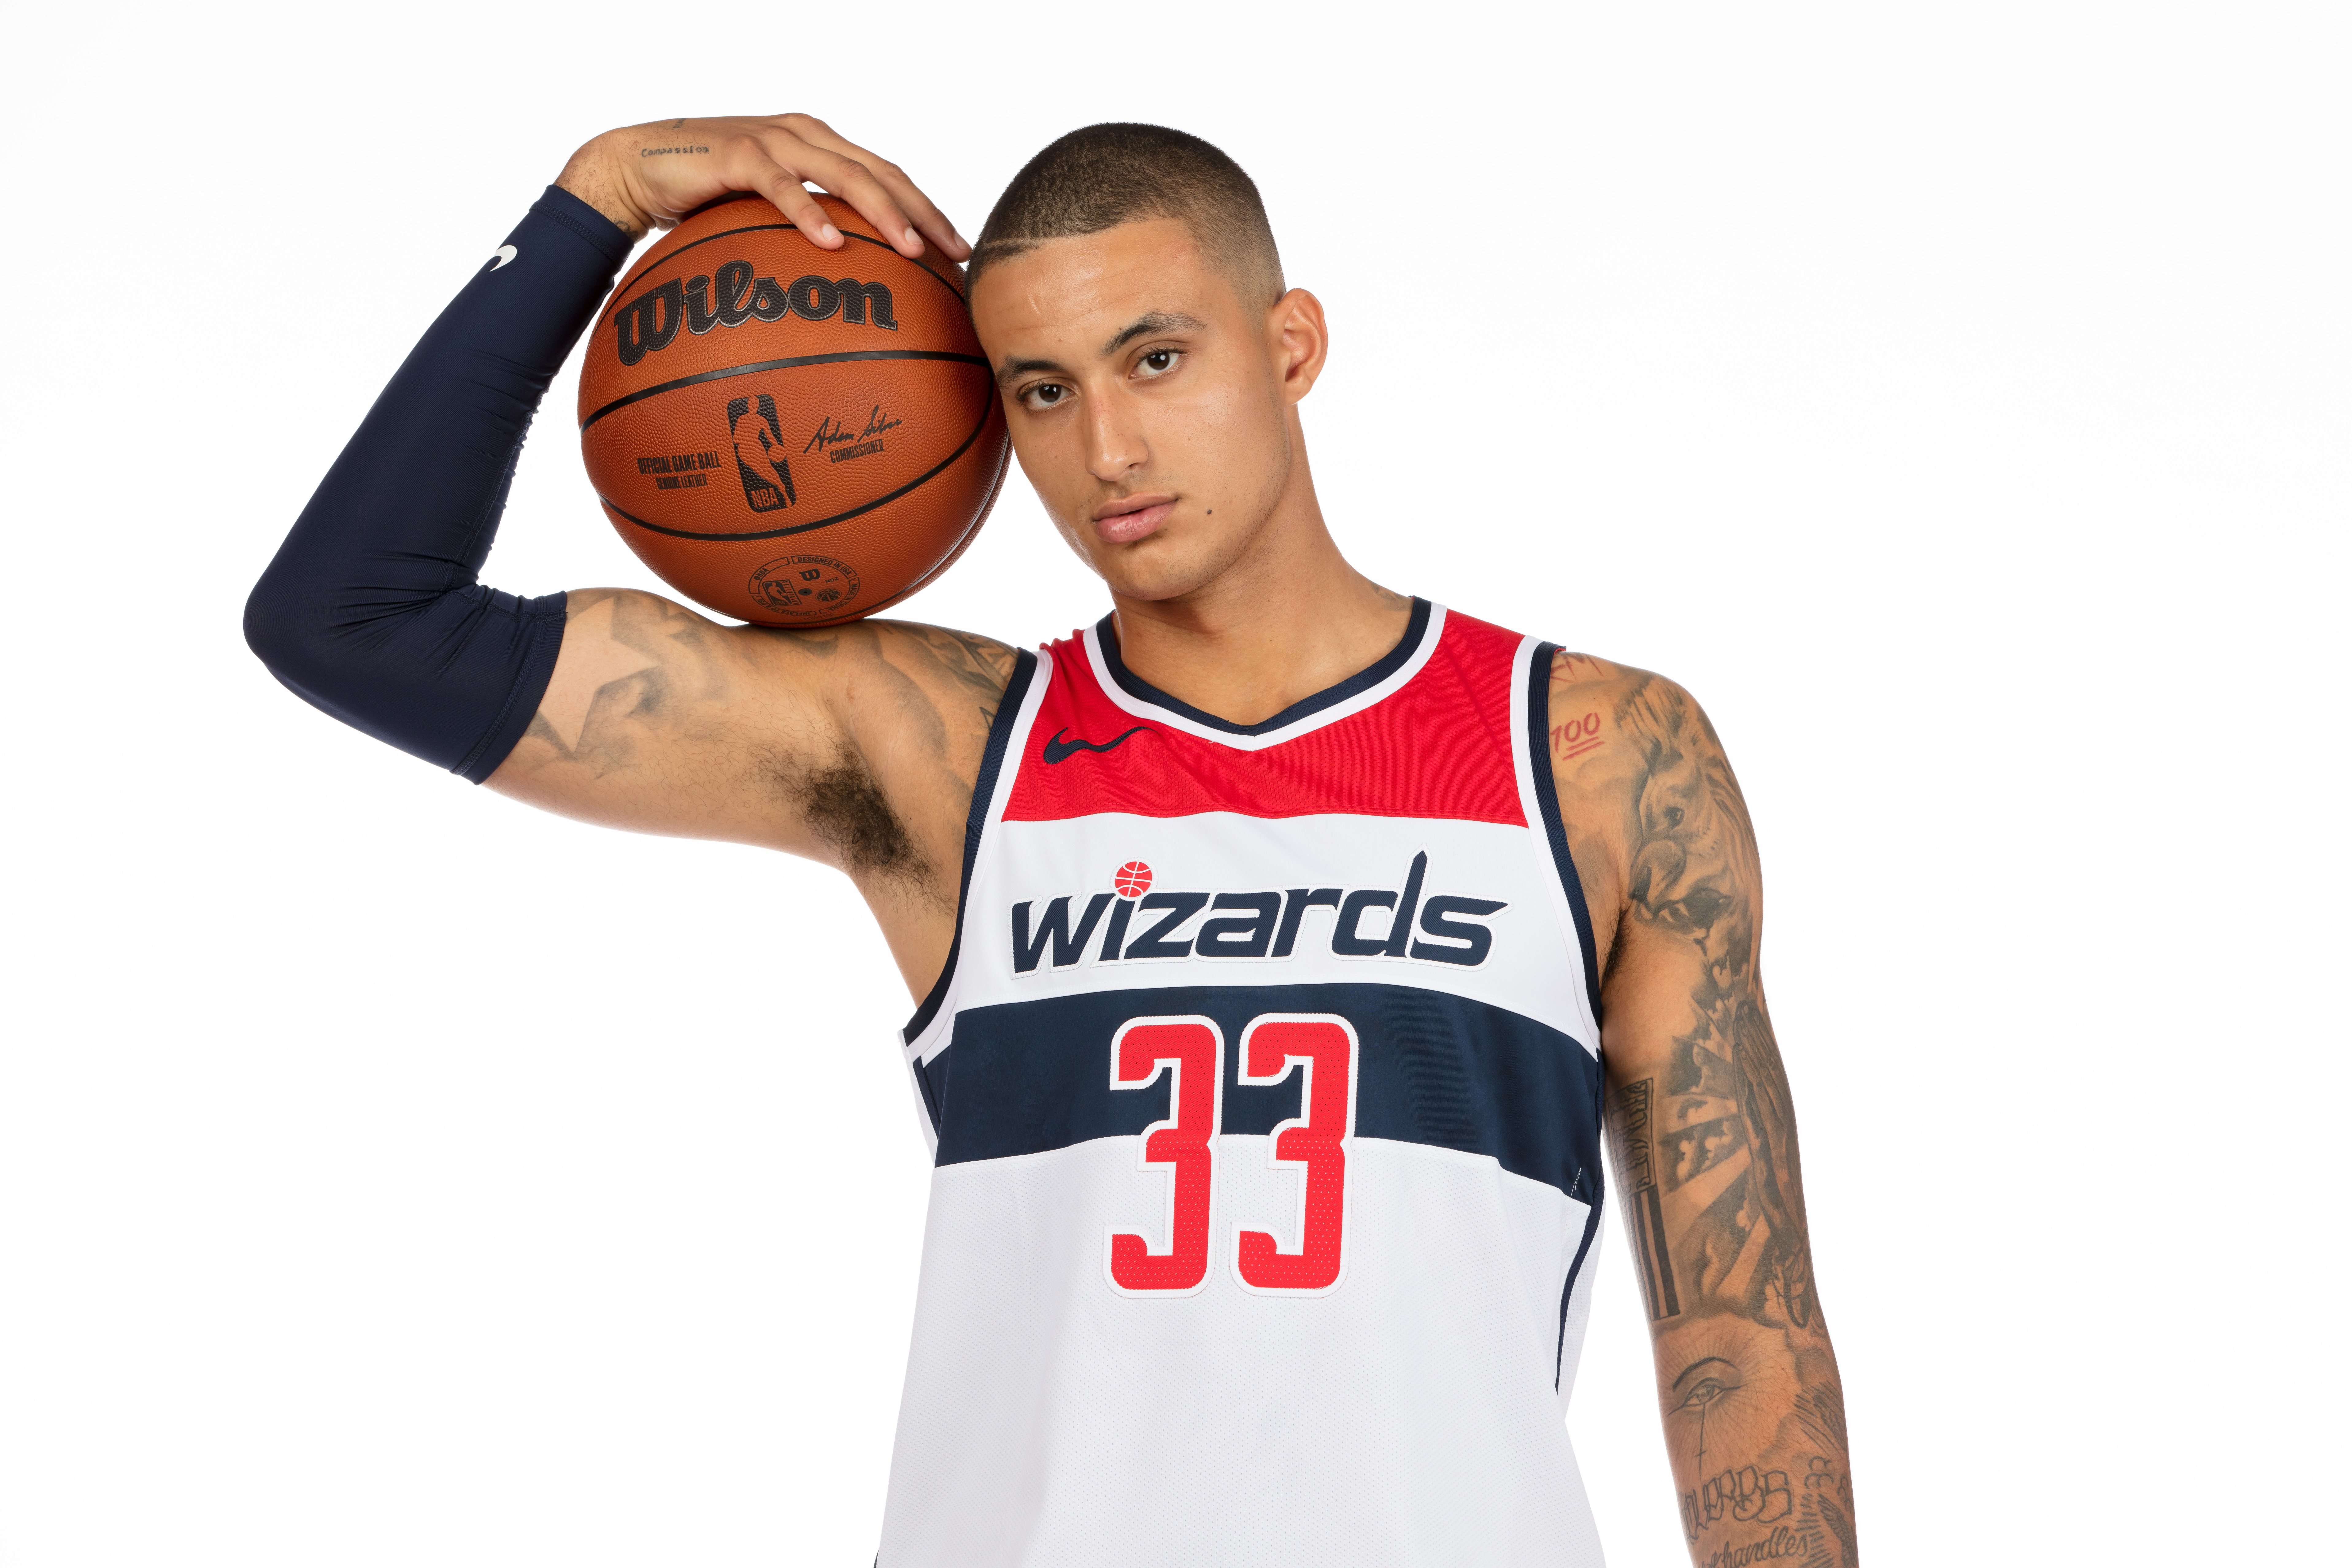 Washington Wizards Introduce New Player Shoot